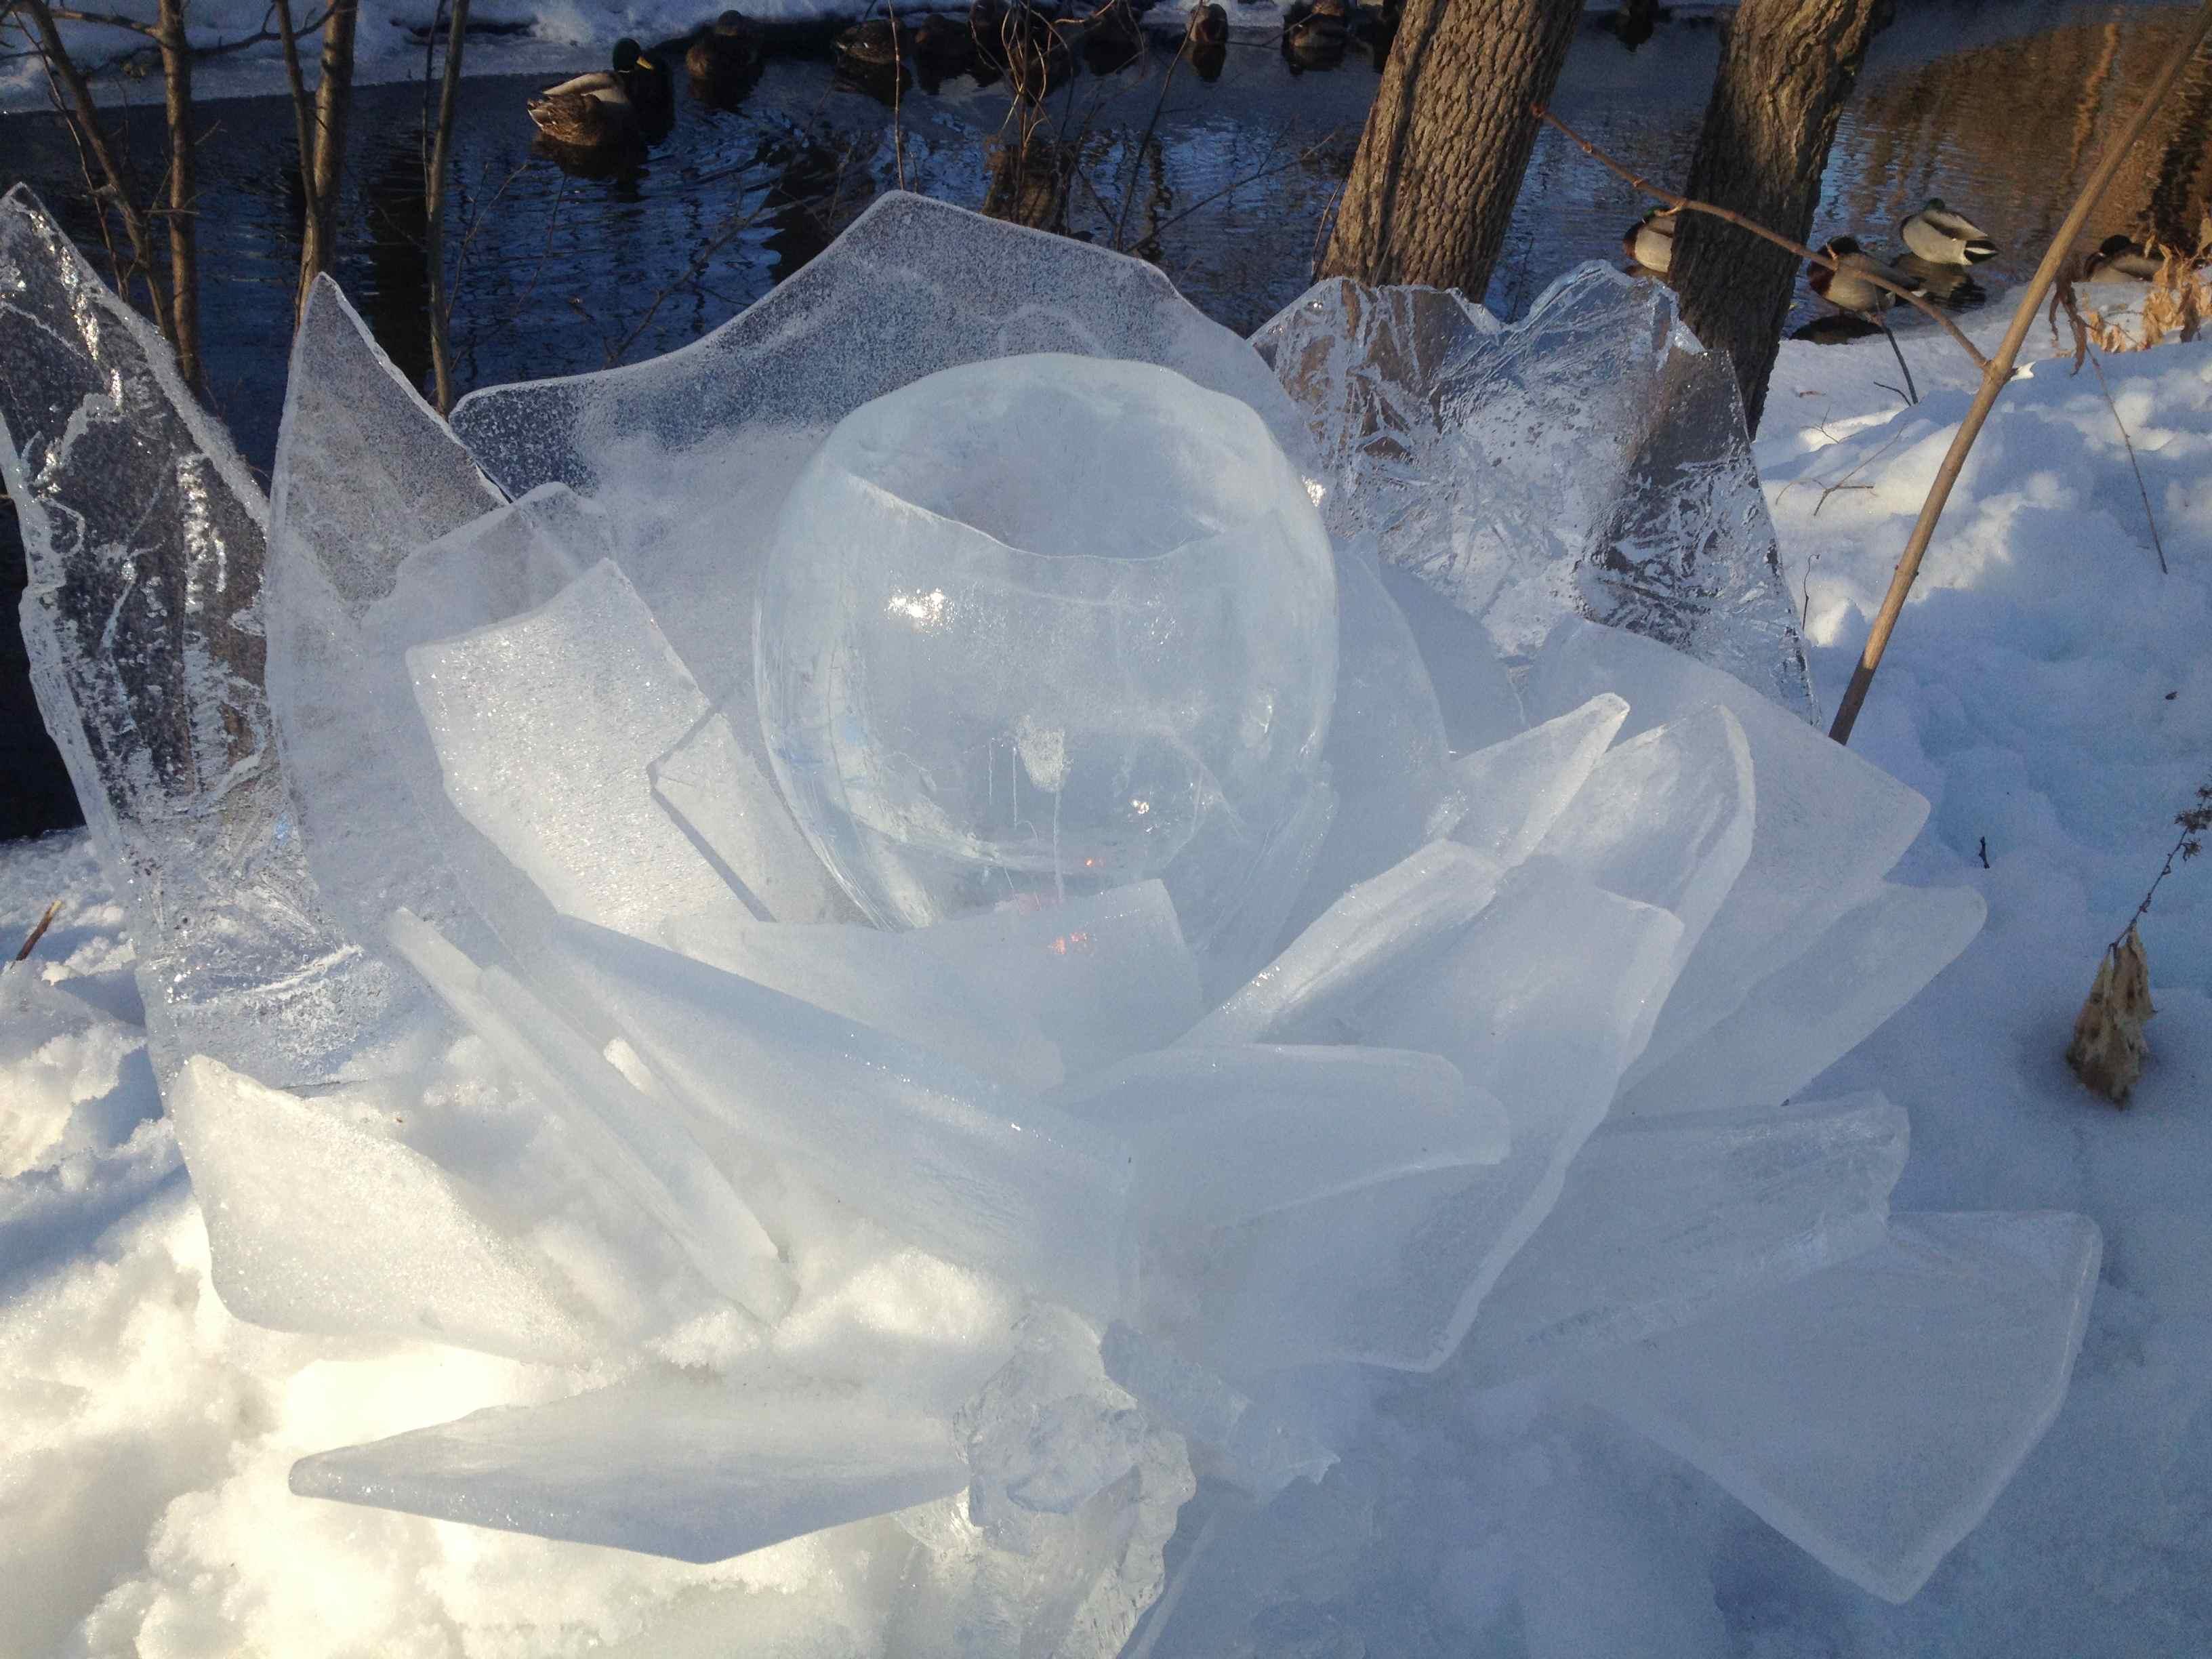 Ice votives